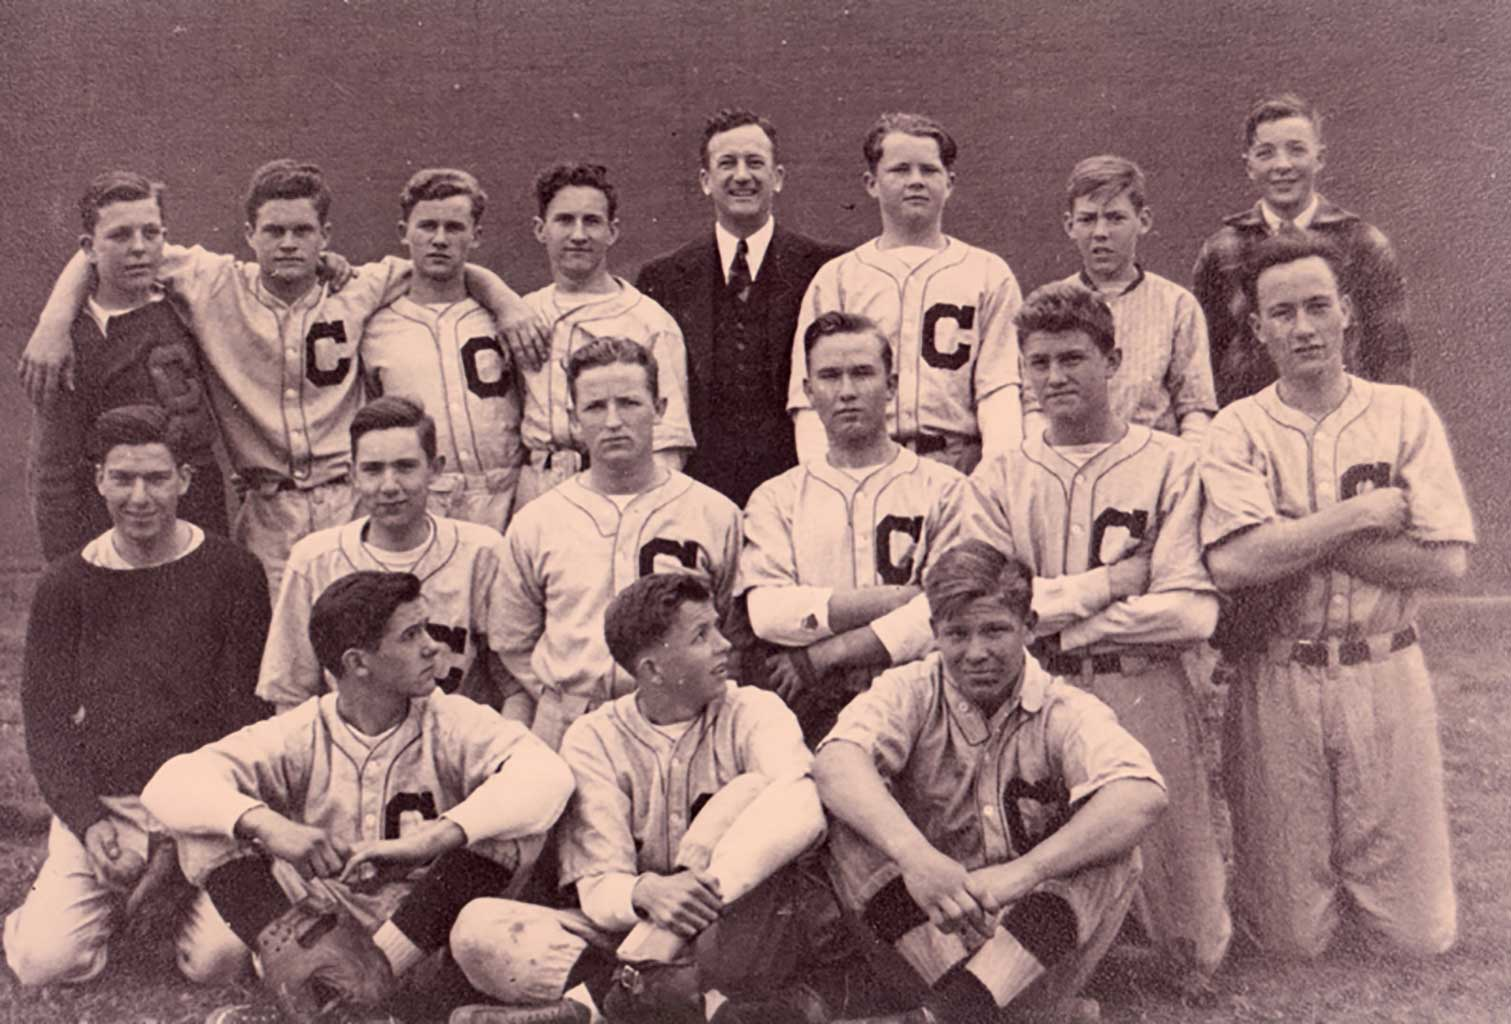 chs-baseball-team-1940-img016